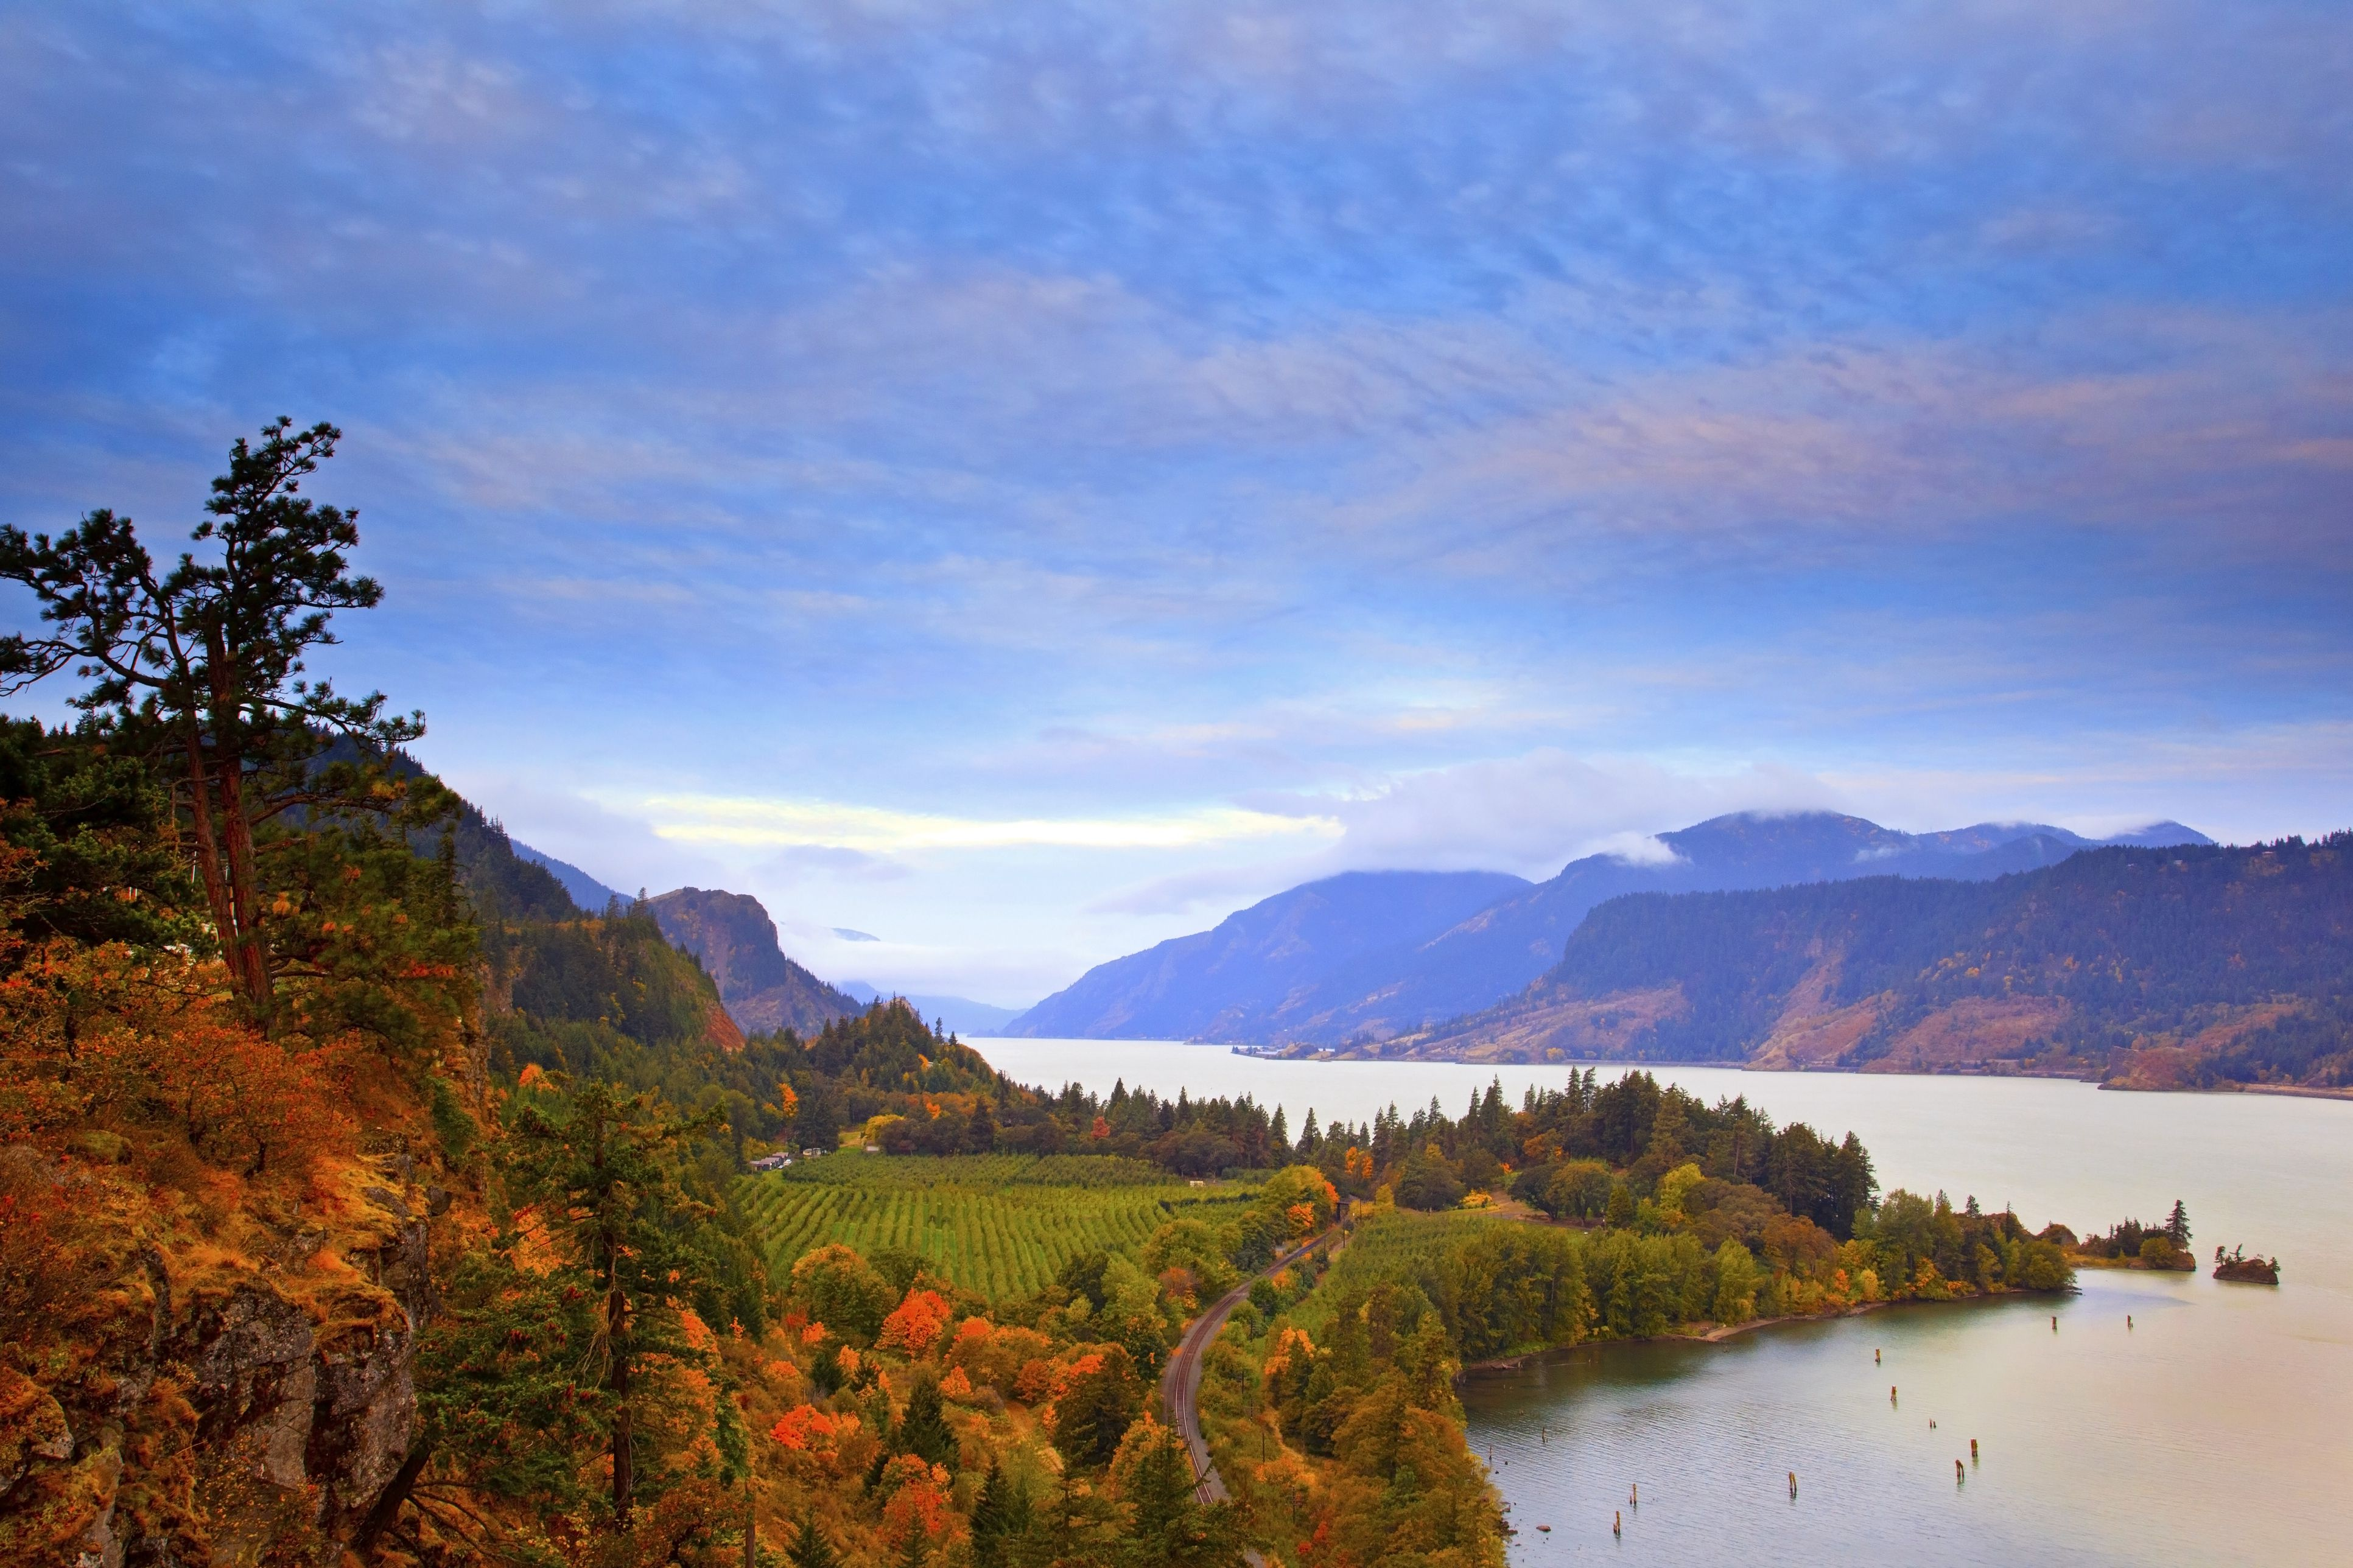 sunrise over Columbia River, Columbia River Gorge National Scenic Area, Oregon, Pacific Northwest.